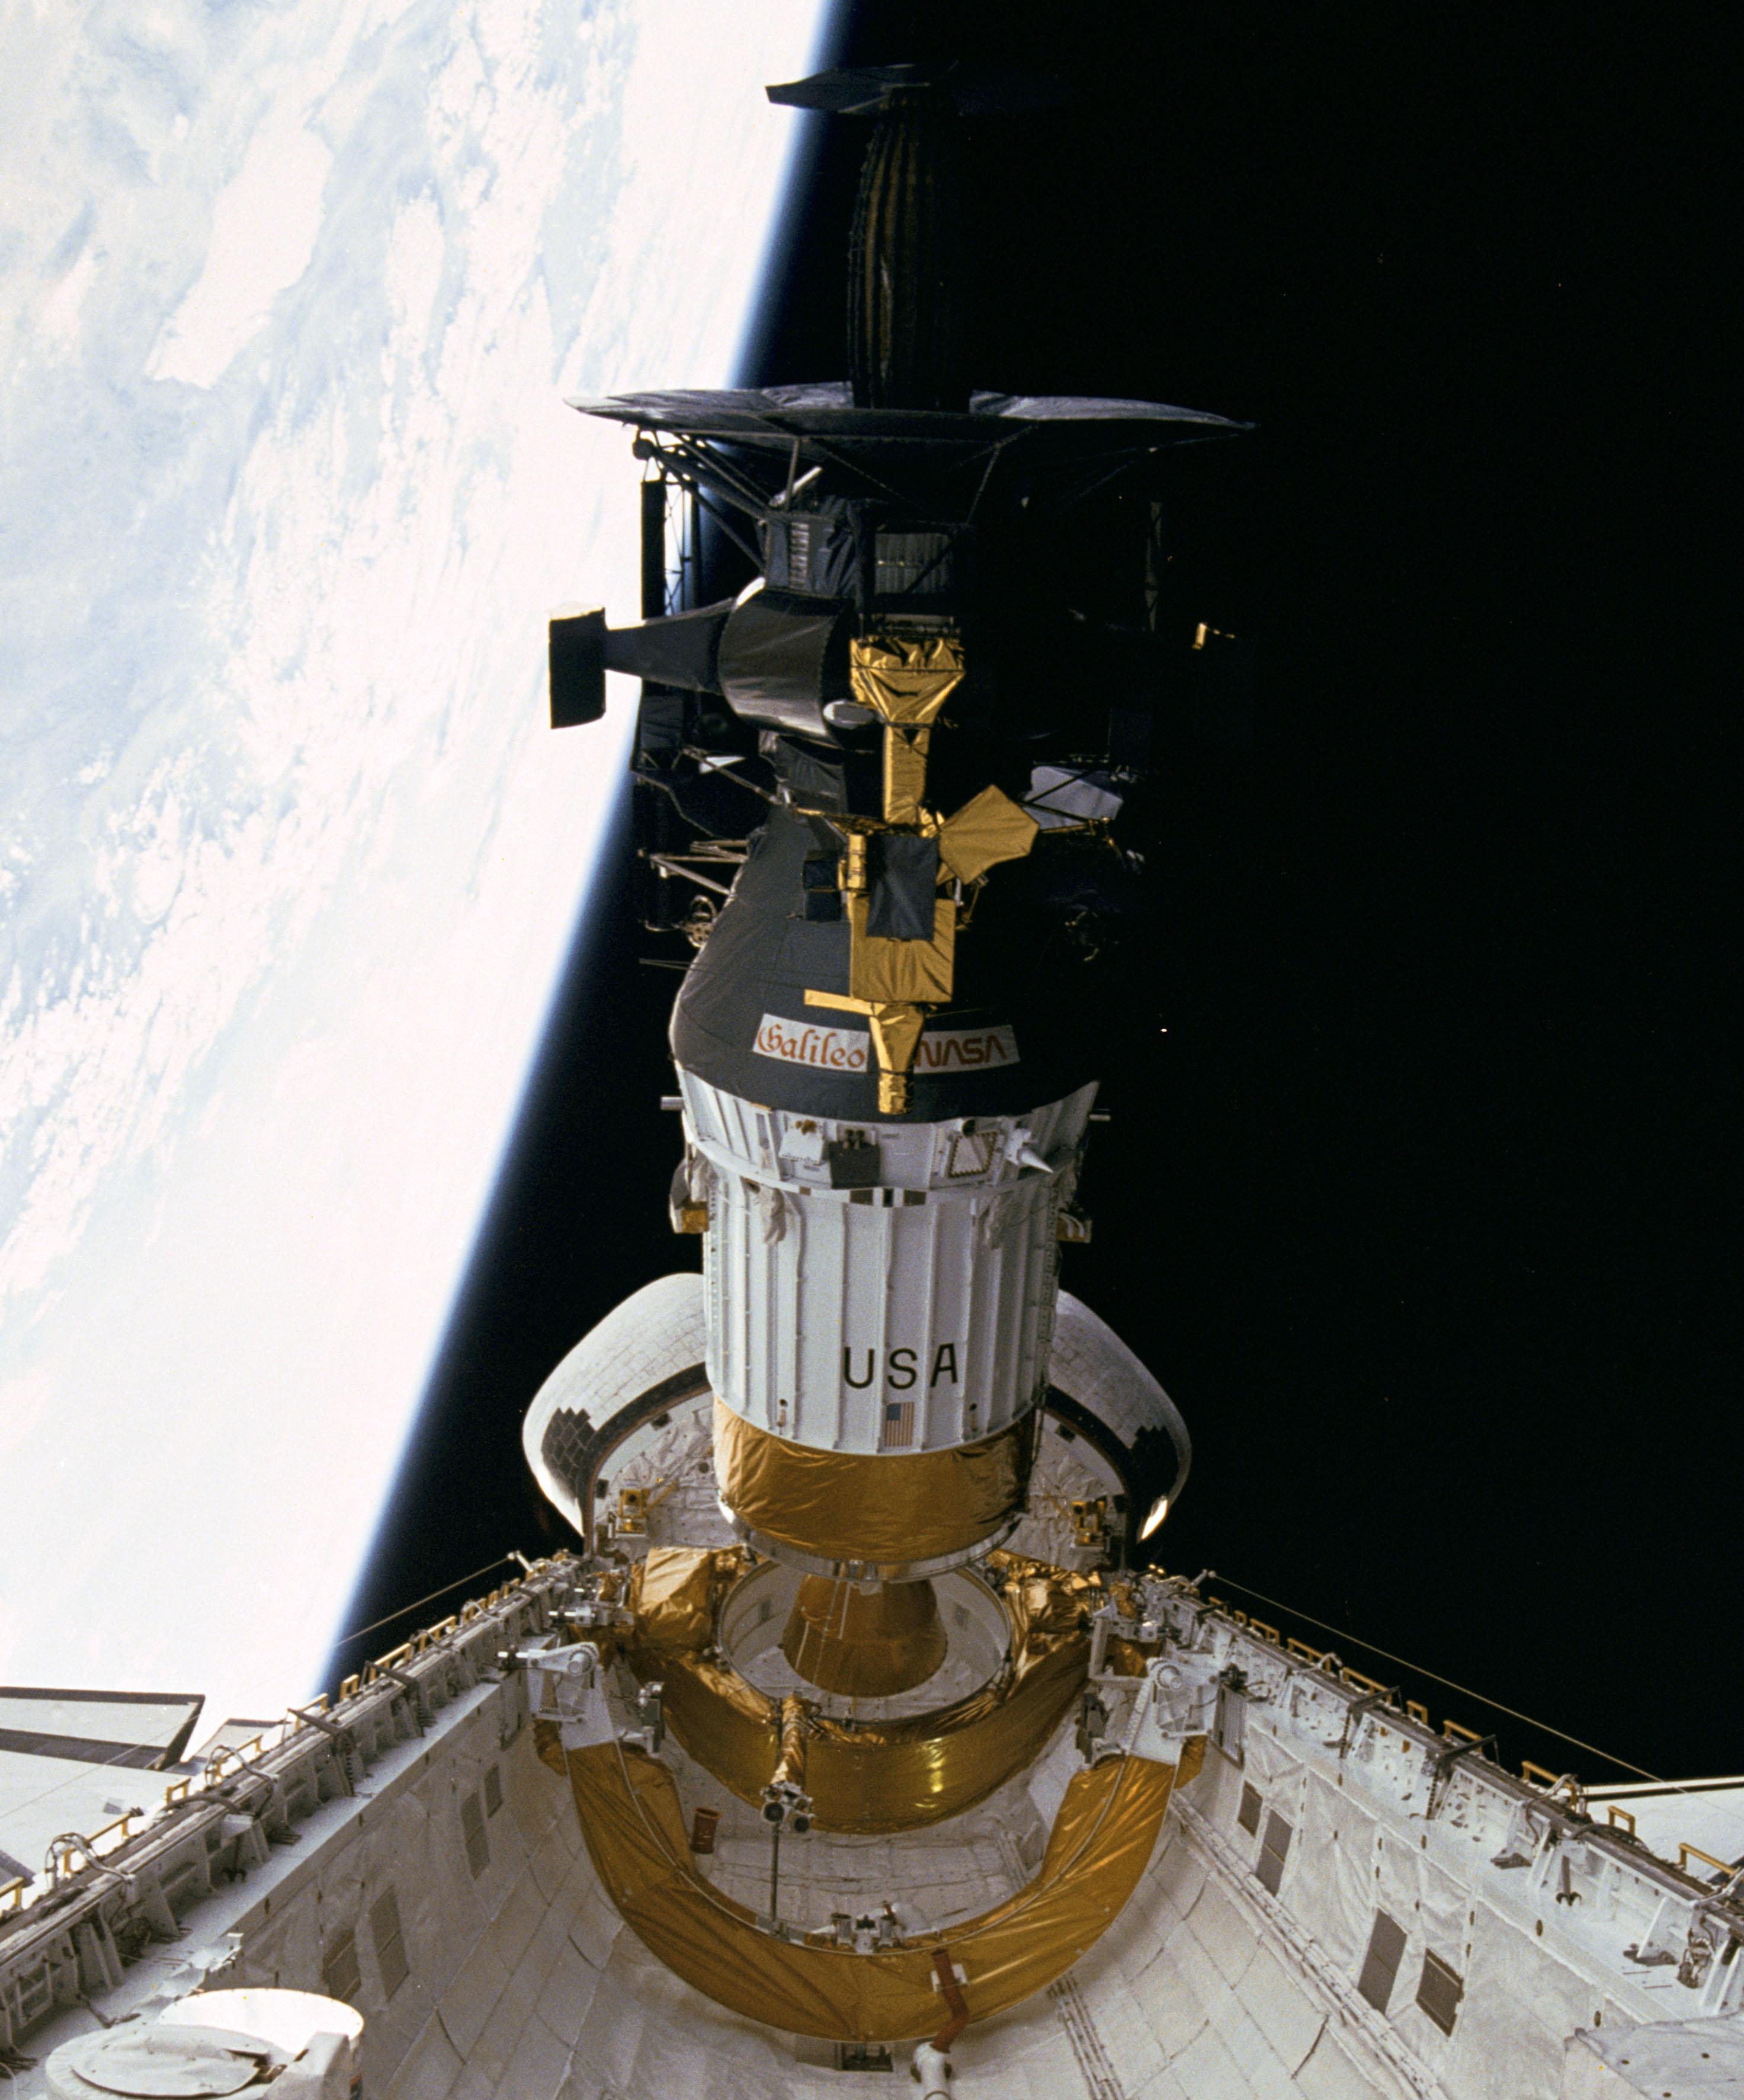 Hughes Galileo probe being deployed.